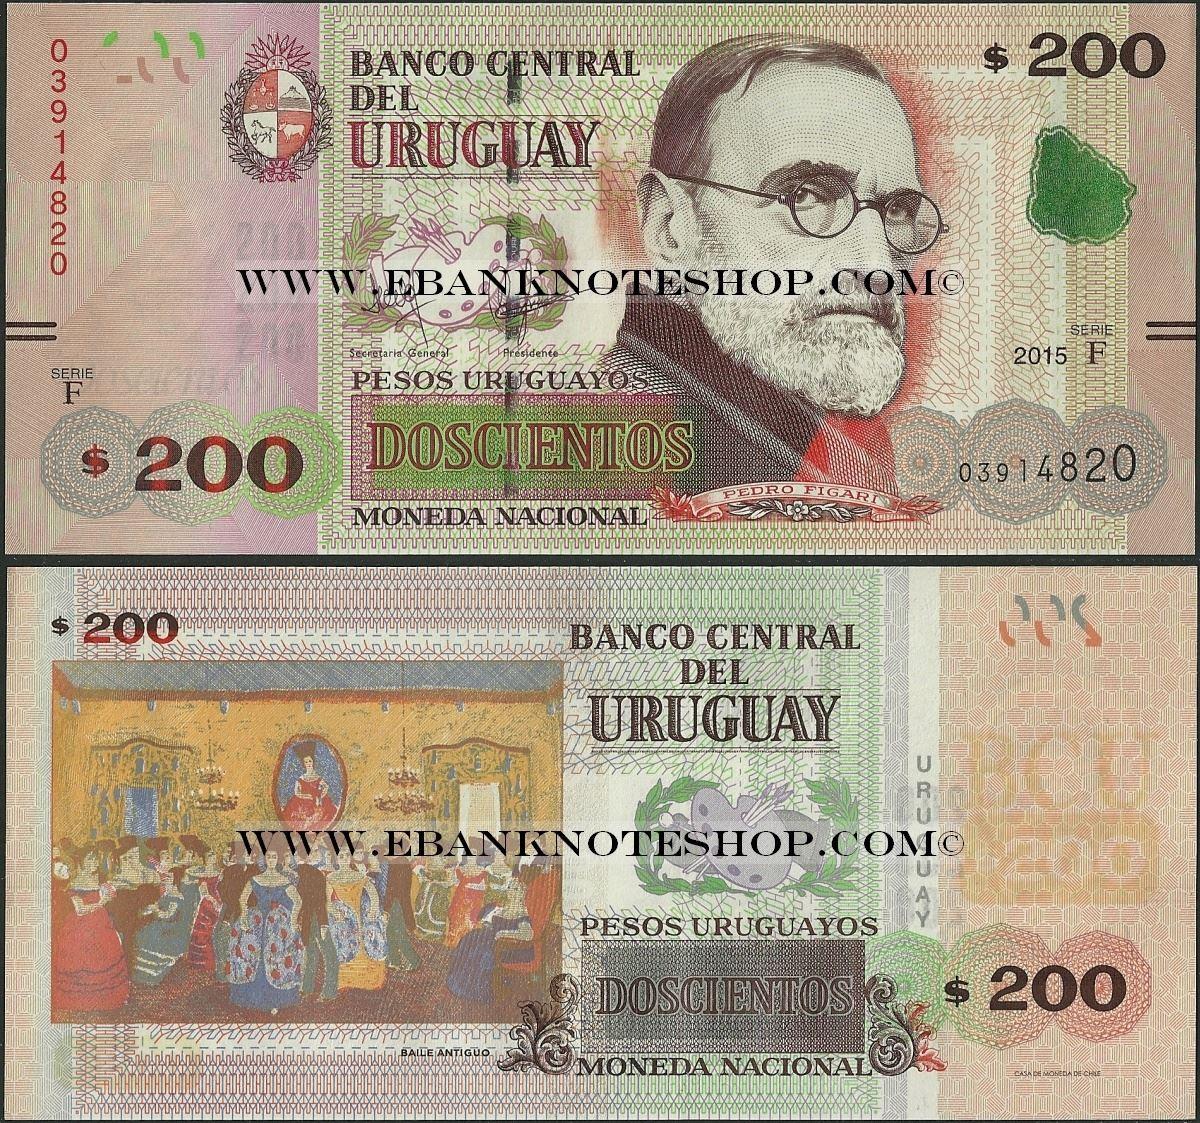 Ebanknoteshop. Uruguay,B557a,1000 Pesos Uruguayos,2015